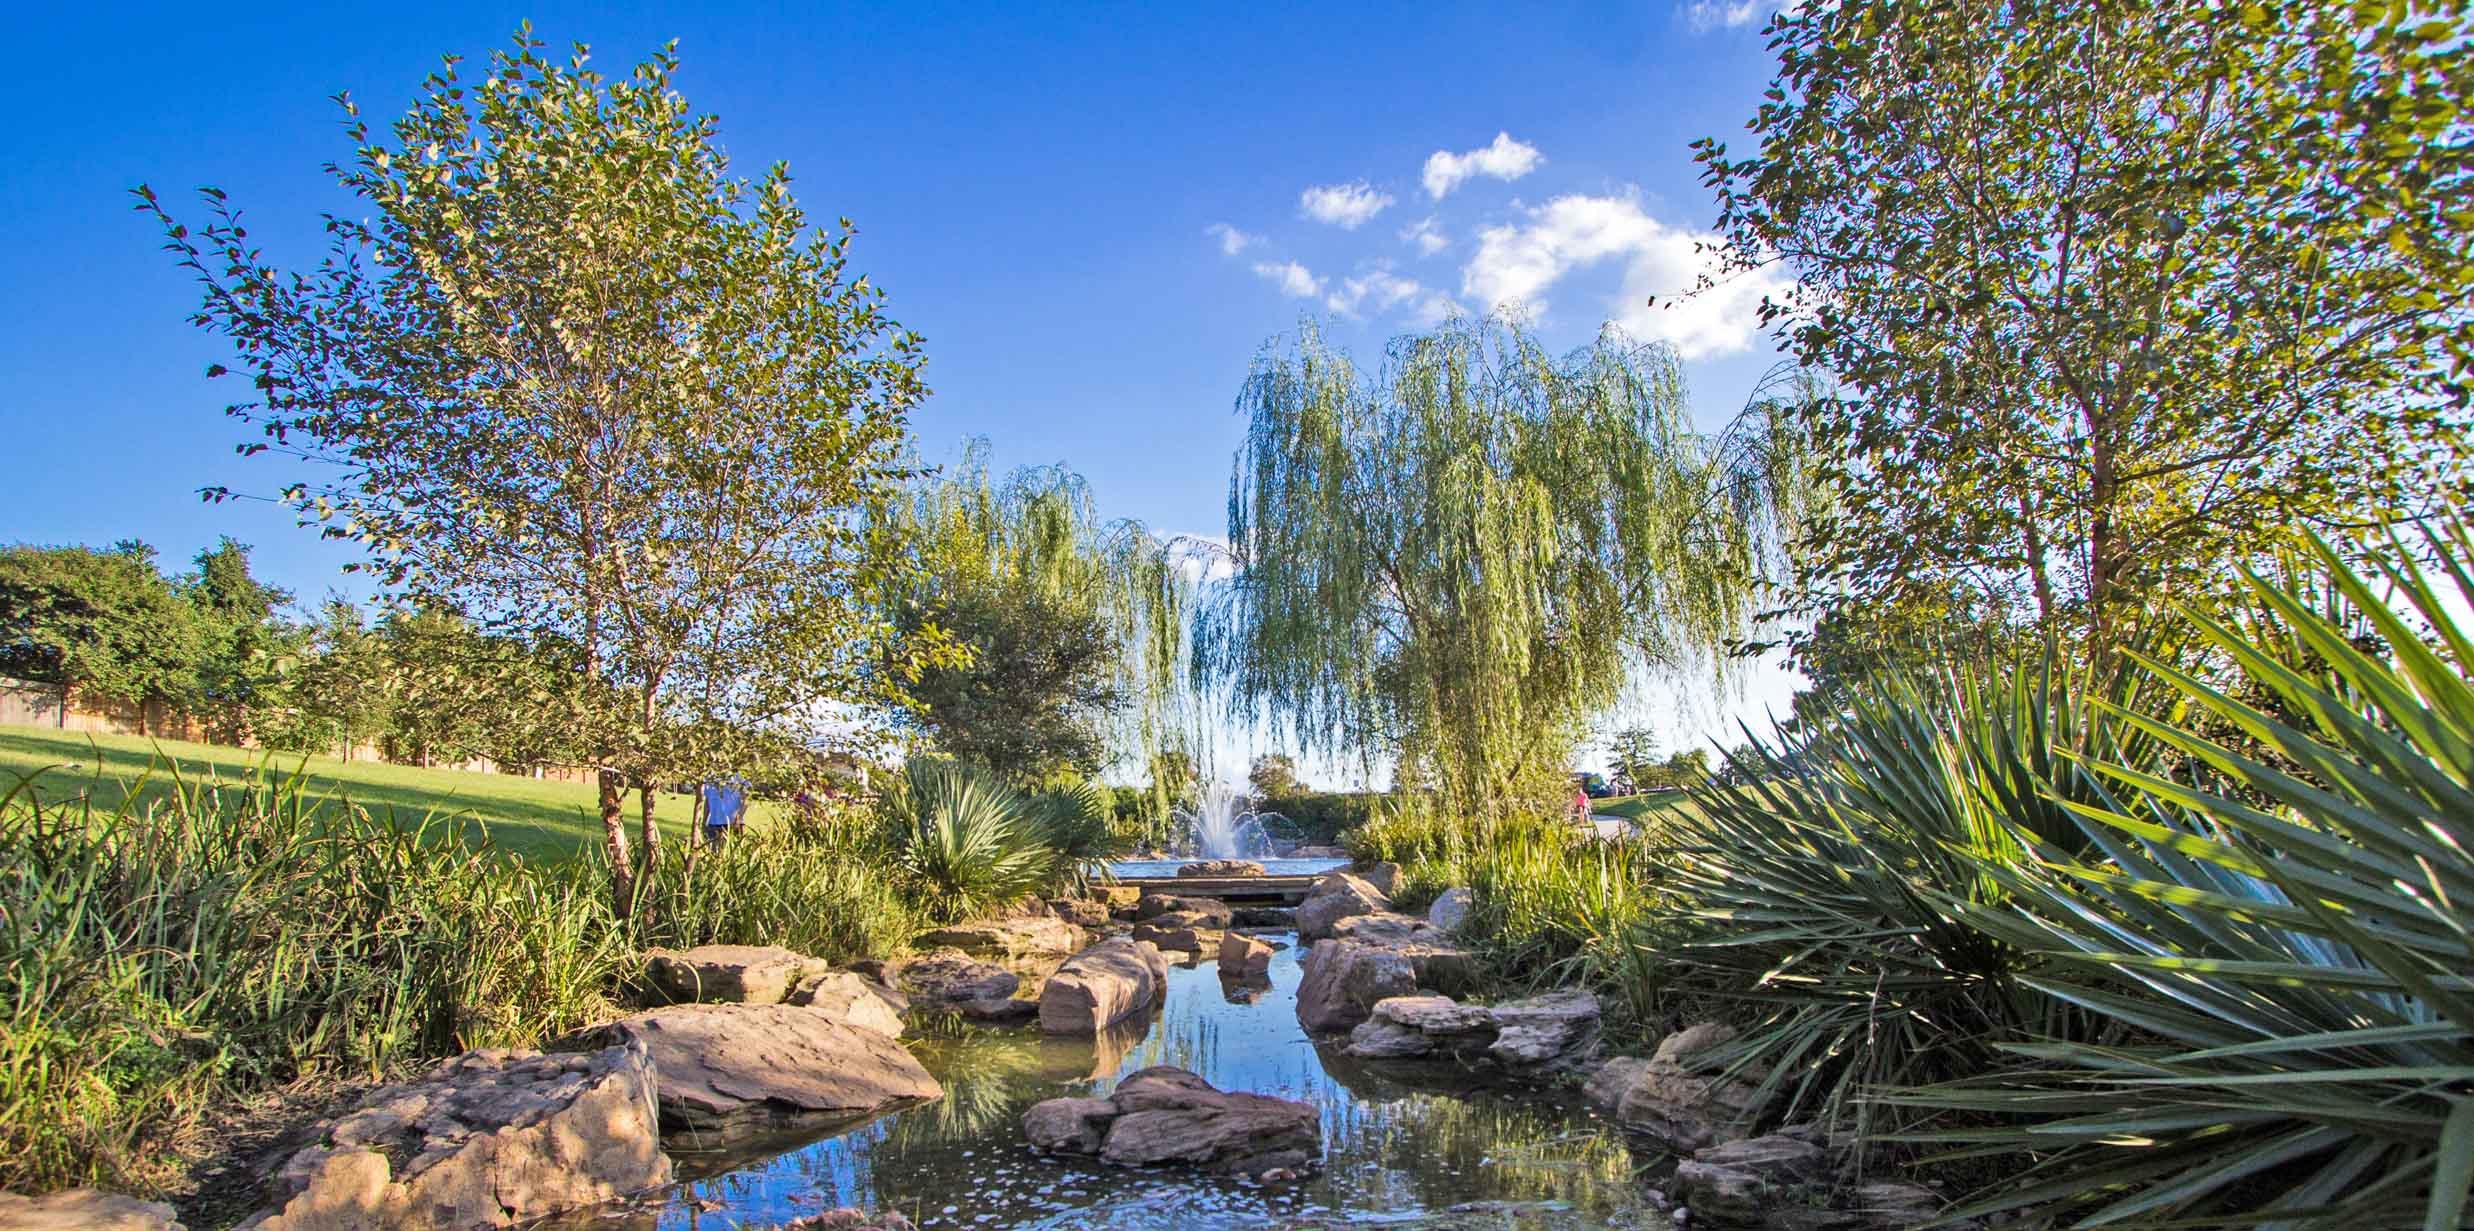 Mandolin Gardens Park